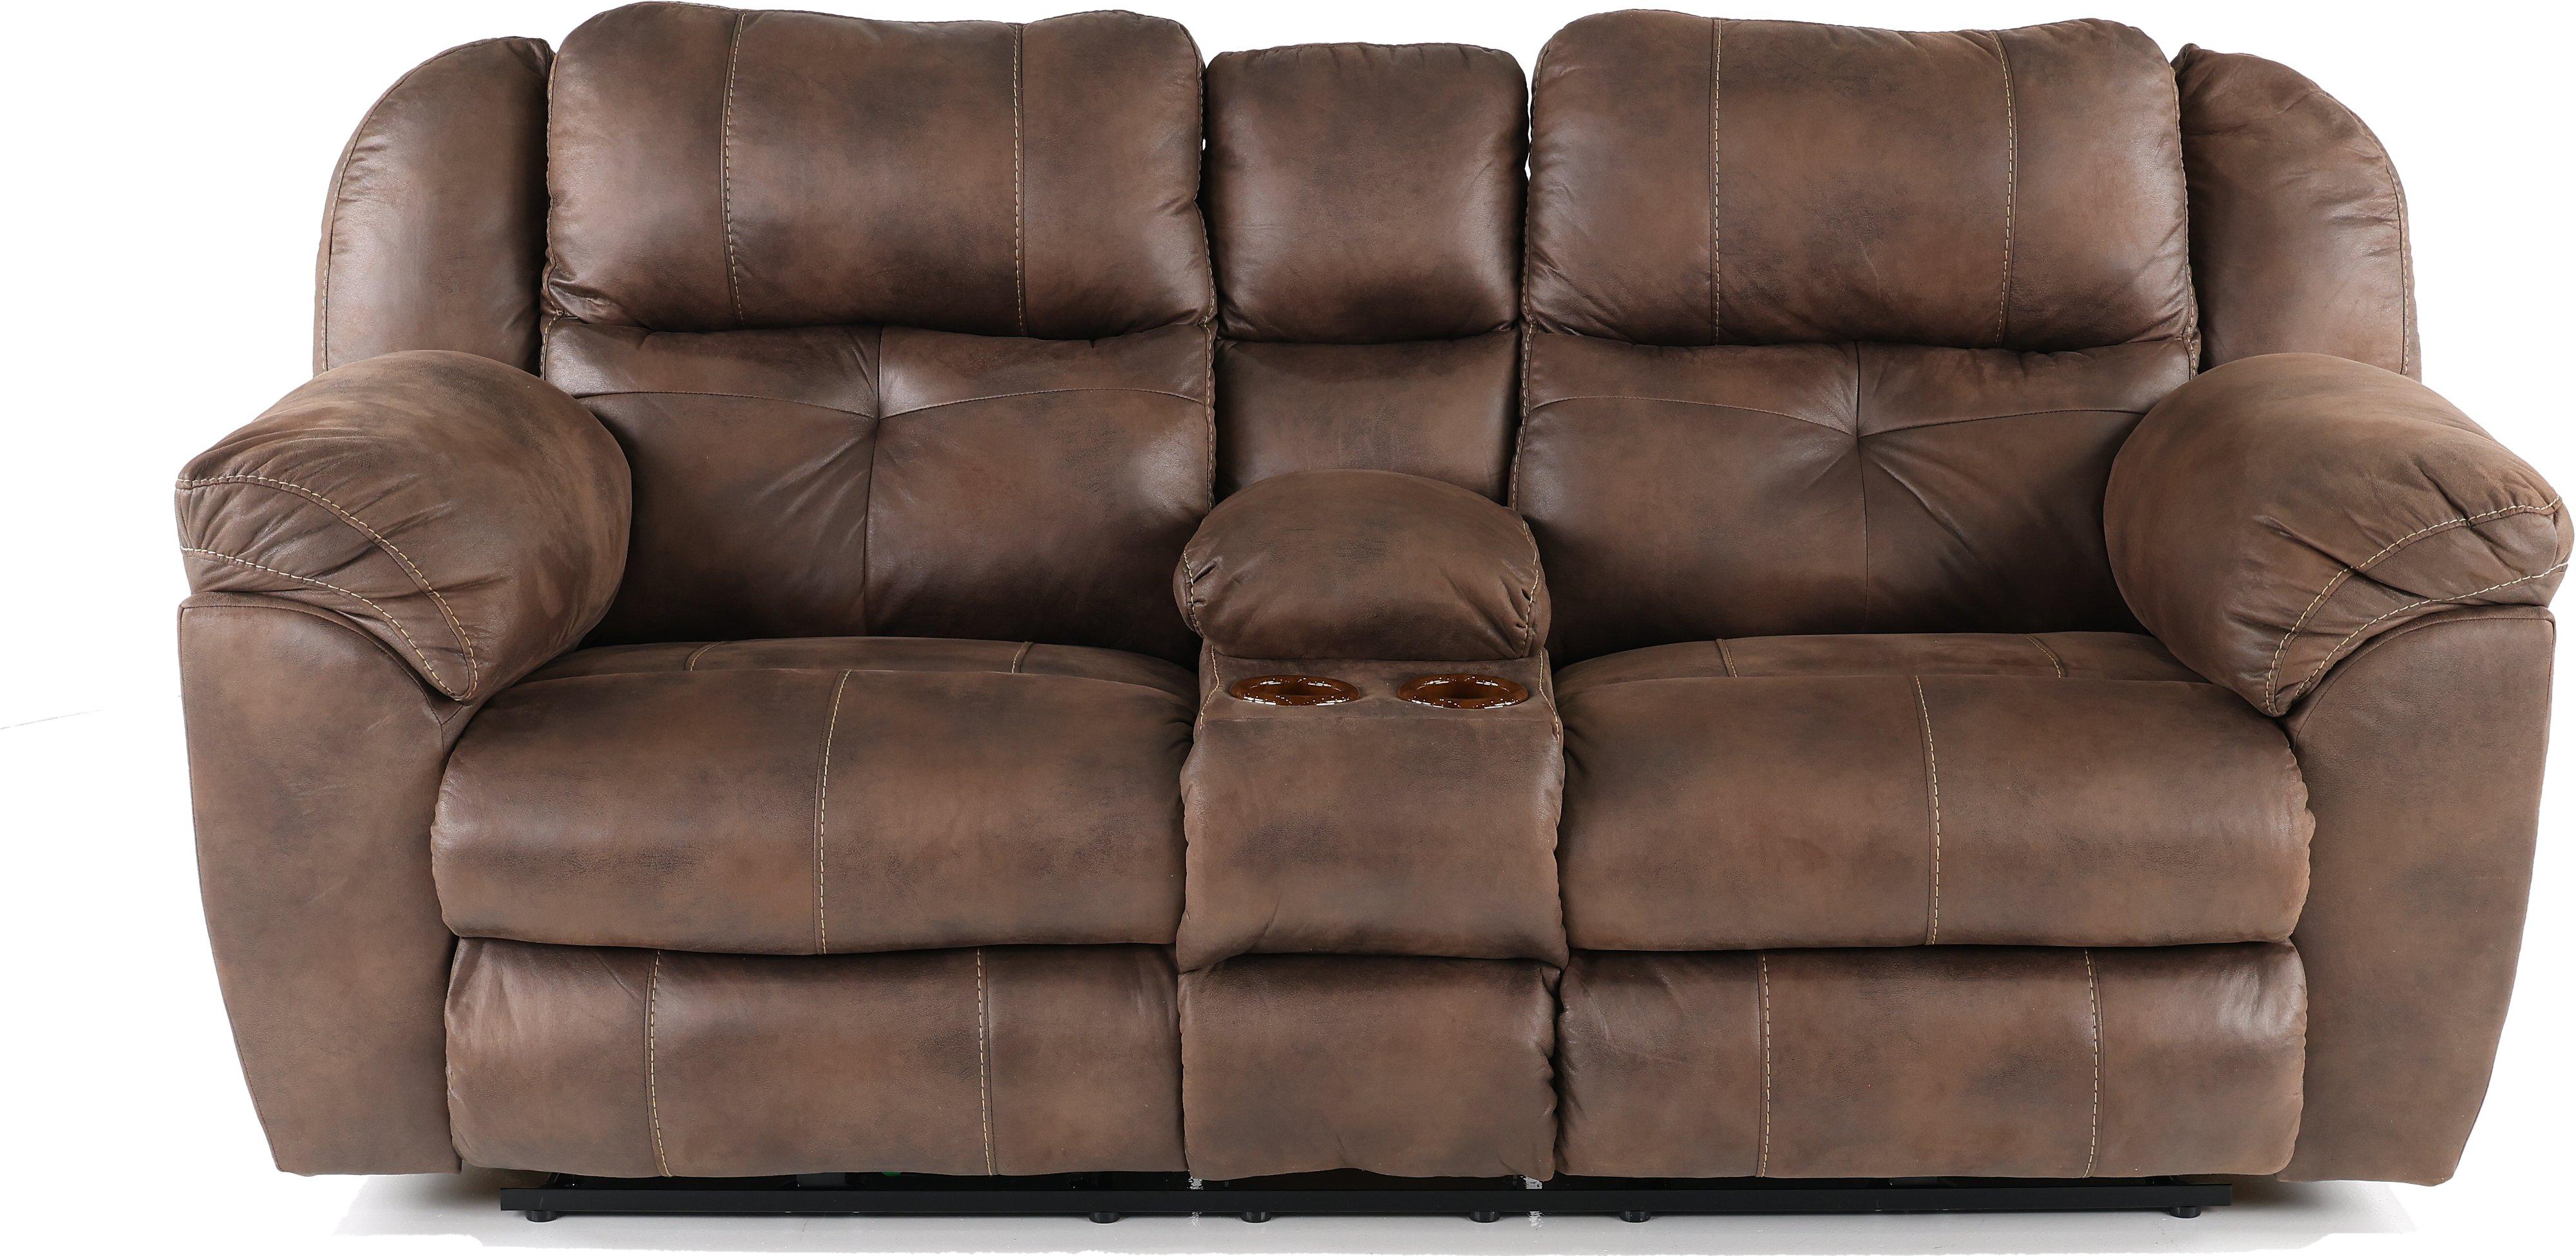 Dusk Brown Power Reclining Sofa Amp Loveseat Ferrington